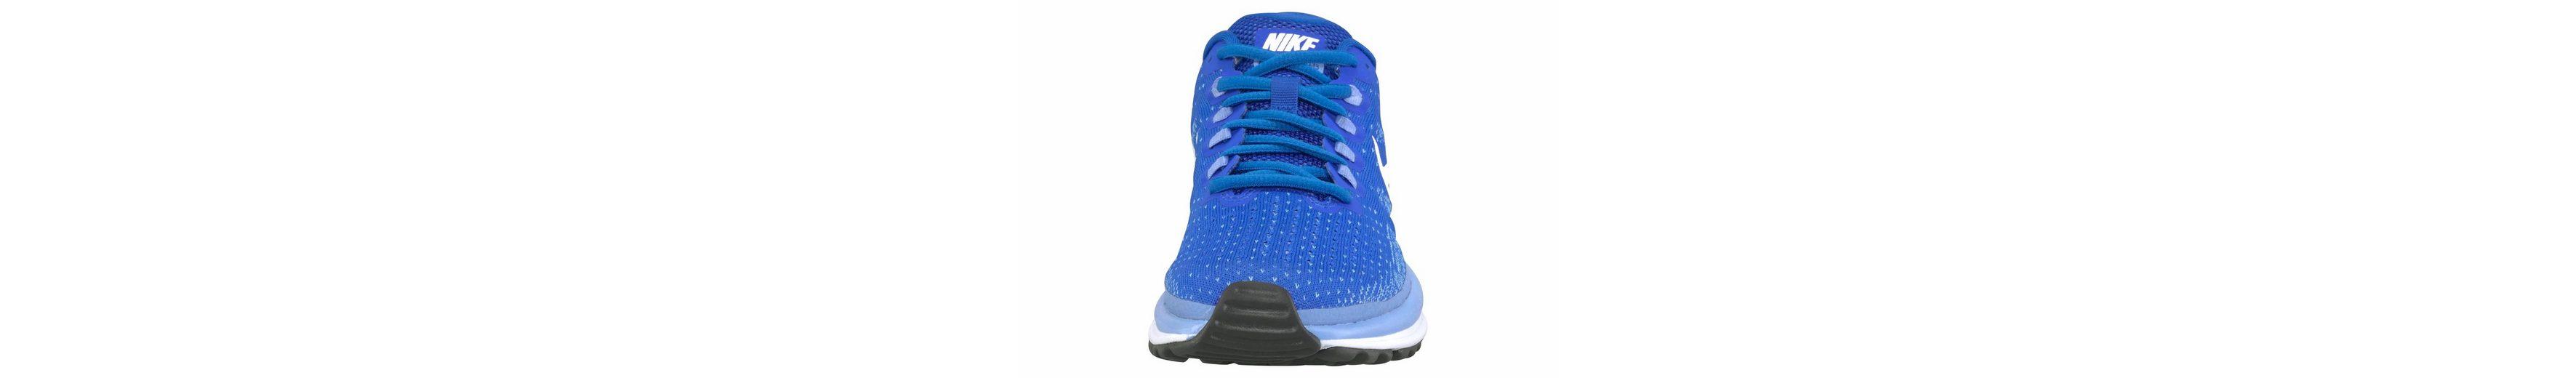 Nike Nike Zoom Vomero Air 13 Wmns Laufschuh Wmns 574qr5